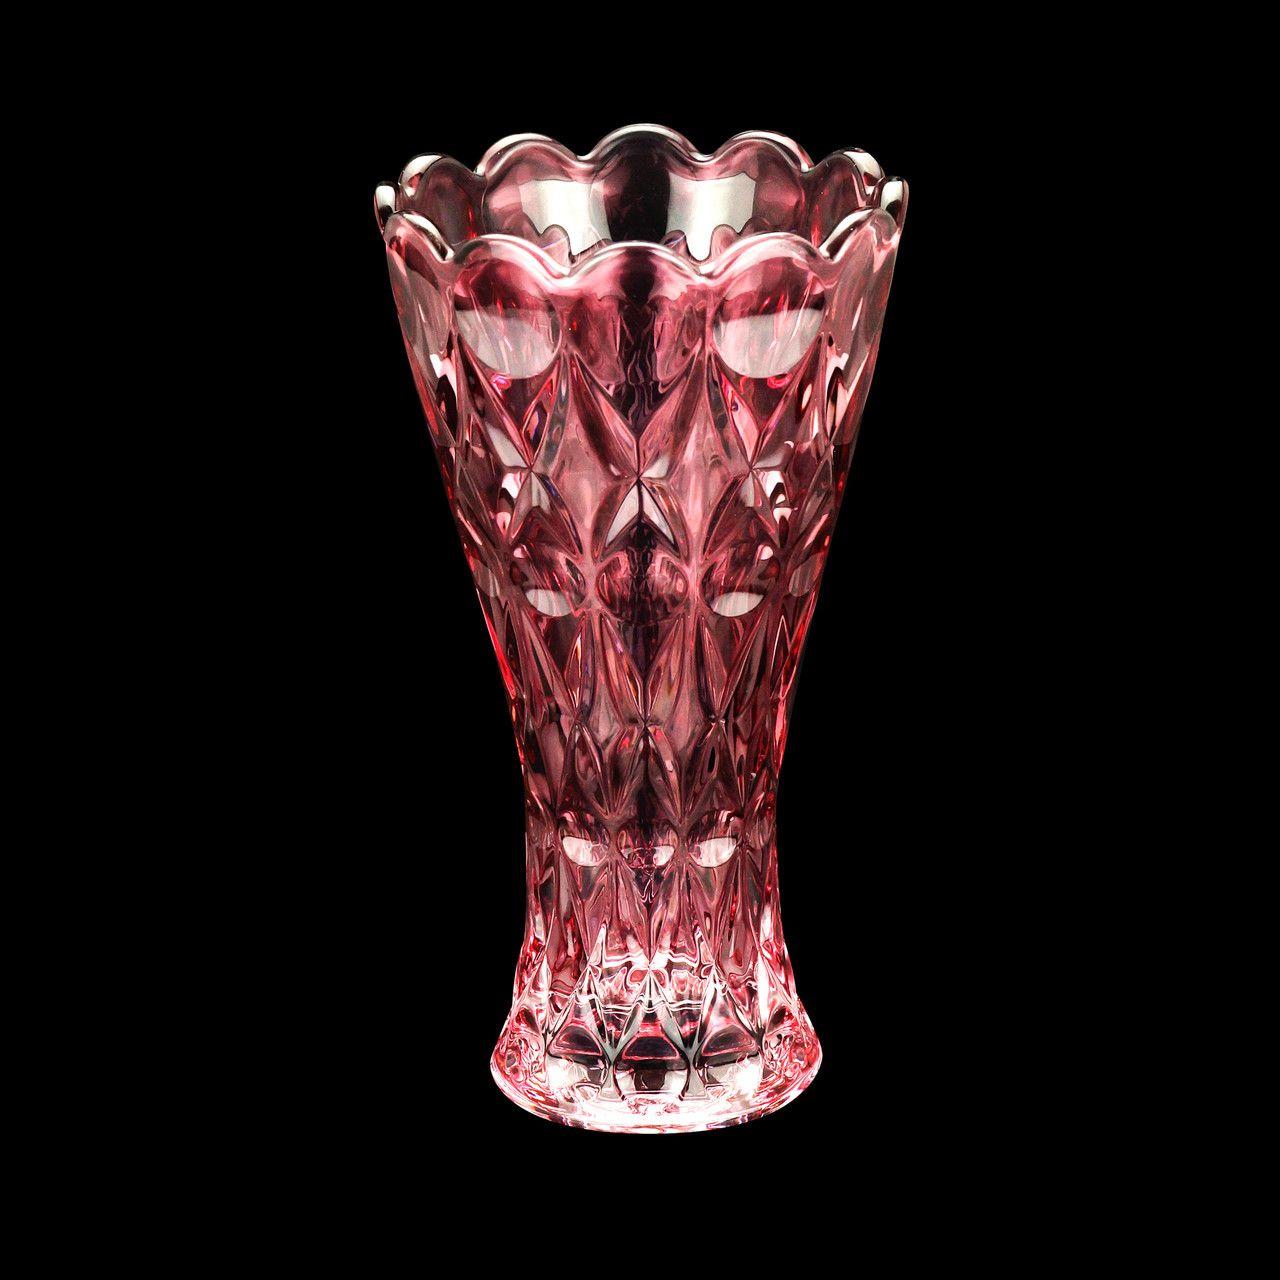 Vaso de Cristal Angel Rosa Wolff 25cm